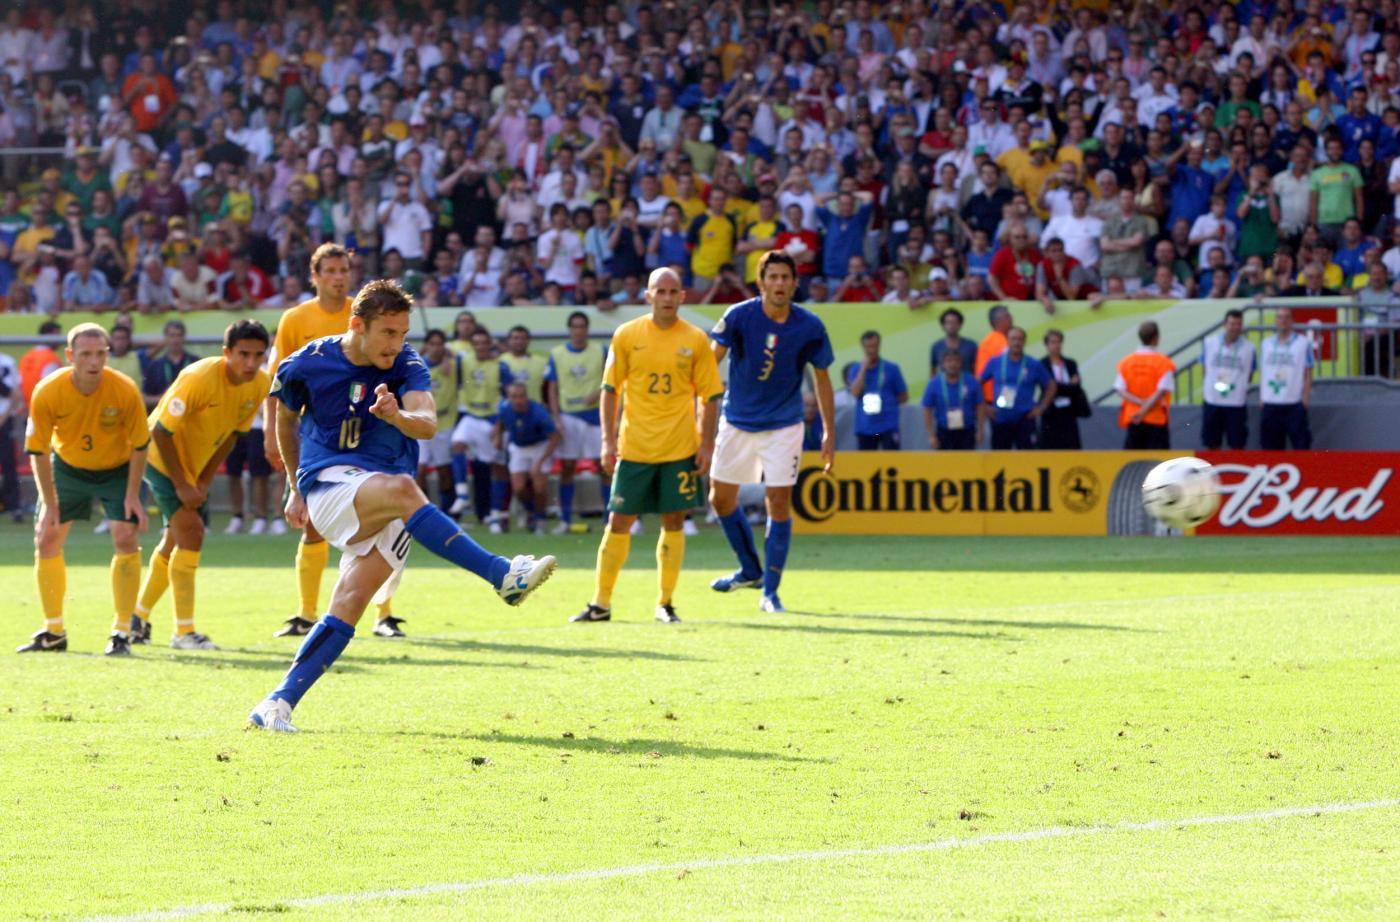 Totti rigore Italia-Australia 1-0 Mondiali 2006